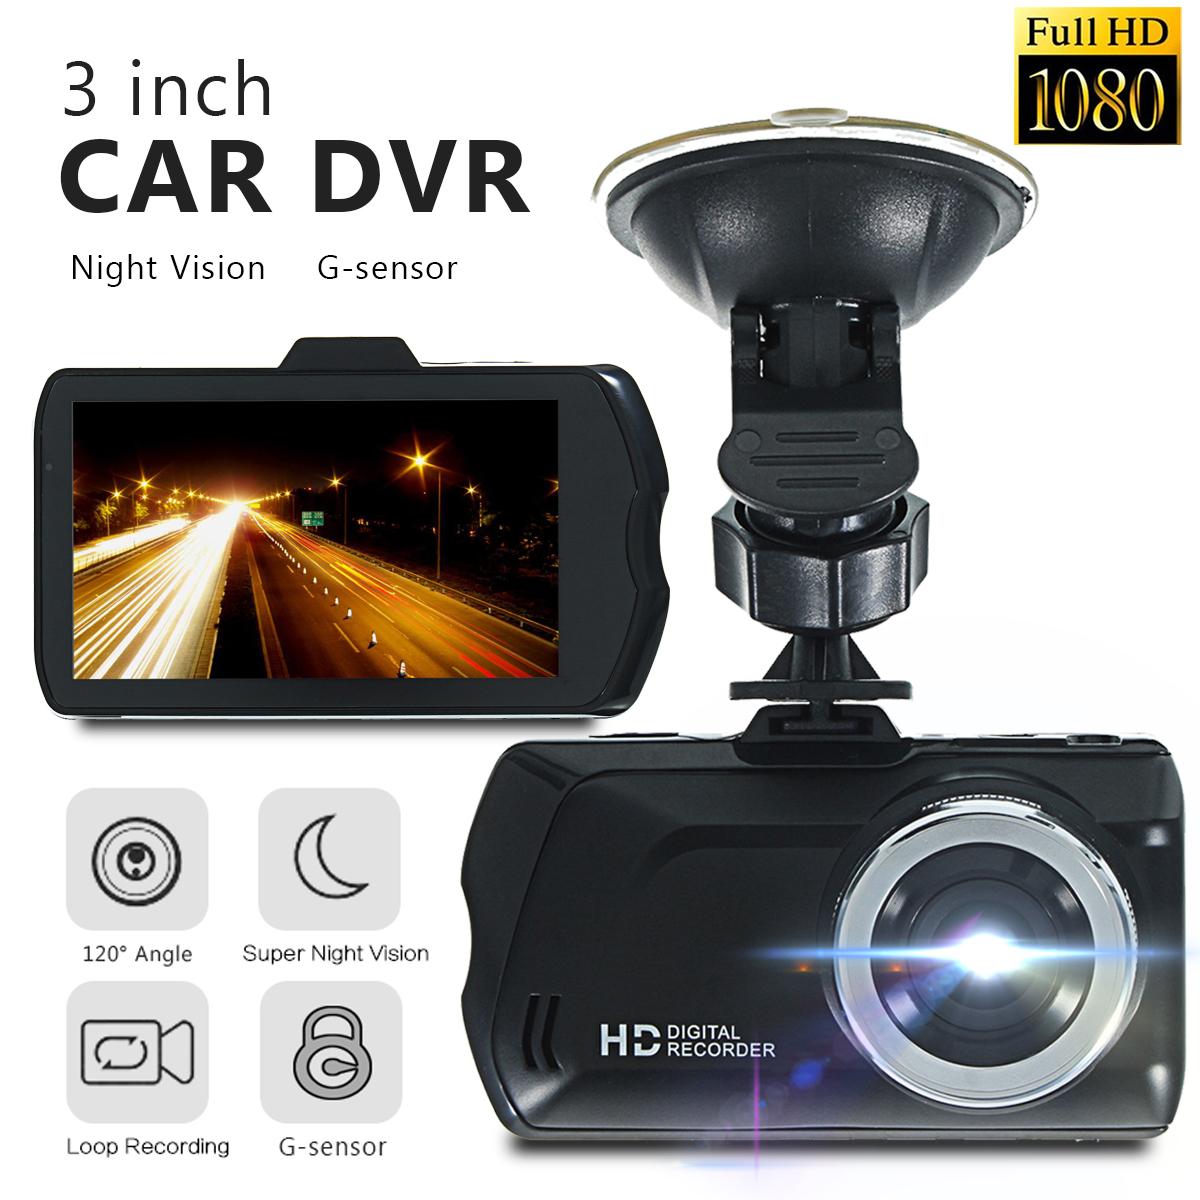 HD 1080P Dash Cam 3 Inch LCD Car Video Recorder DVR Dual ...